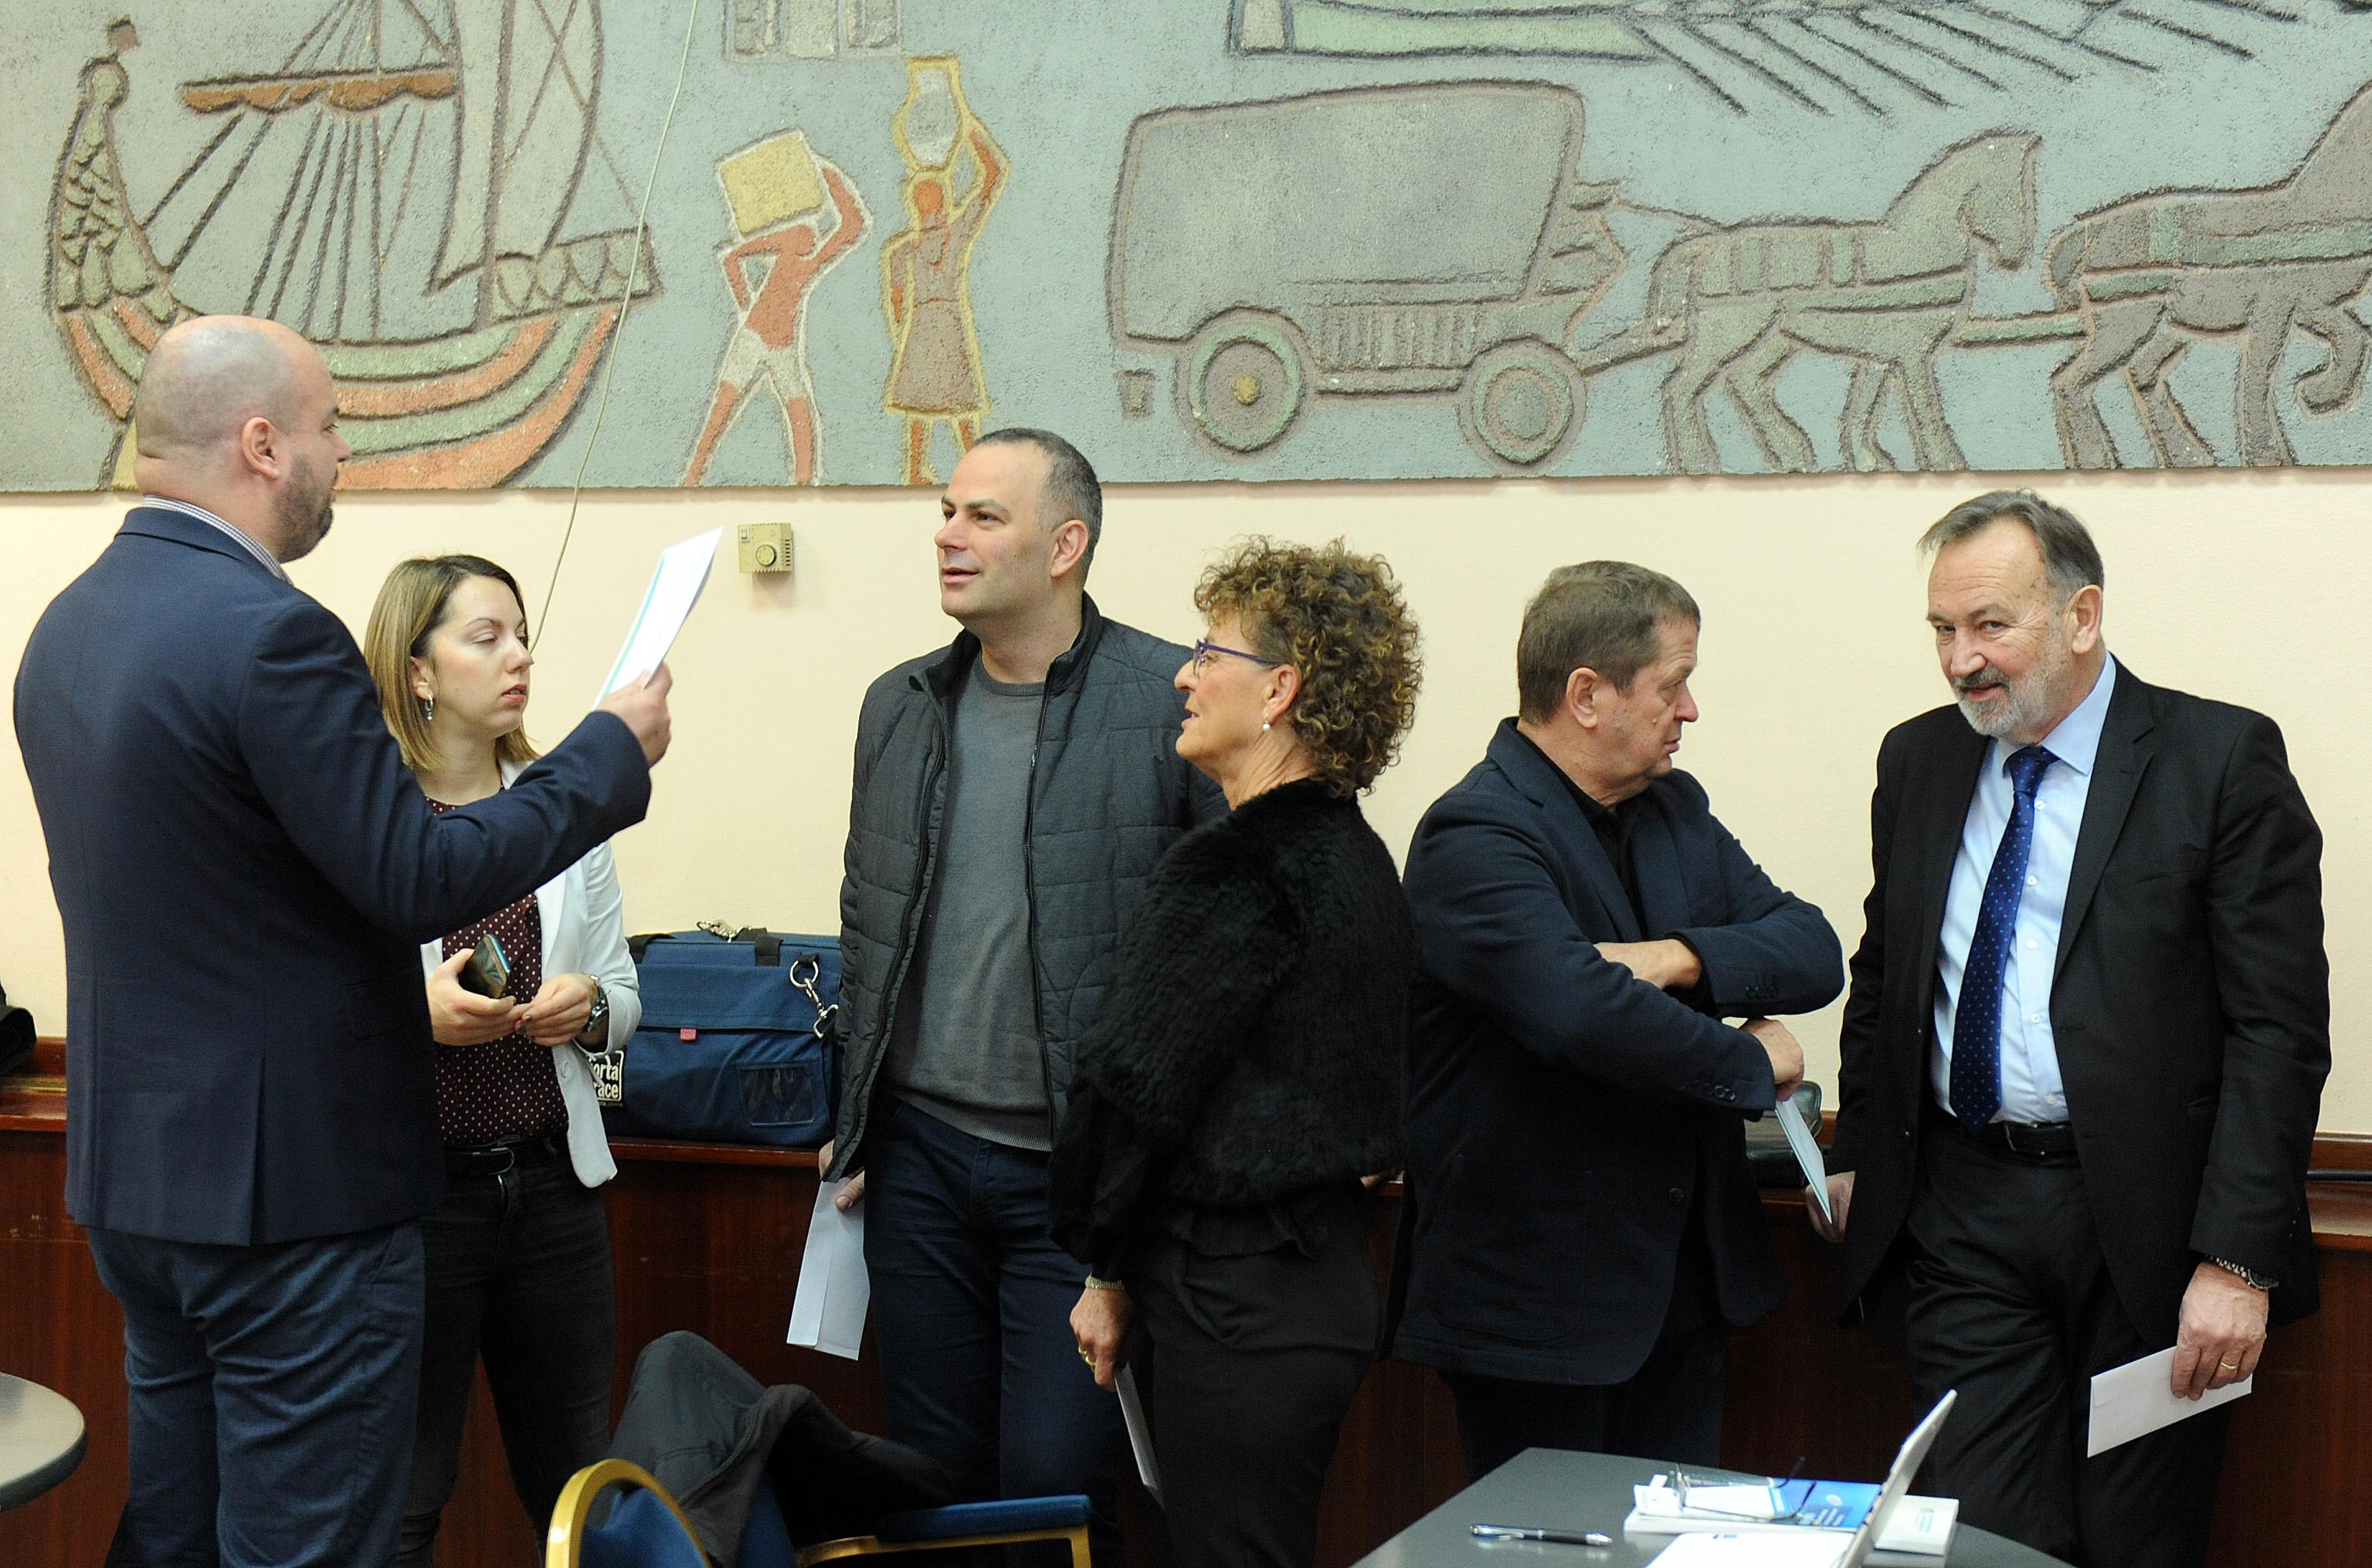 Dobar dio jučerašnjih odluka donesen je jednoglasno / Snimio Marko GRACIN